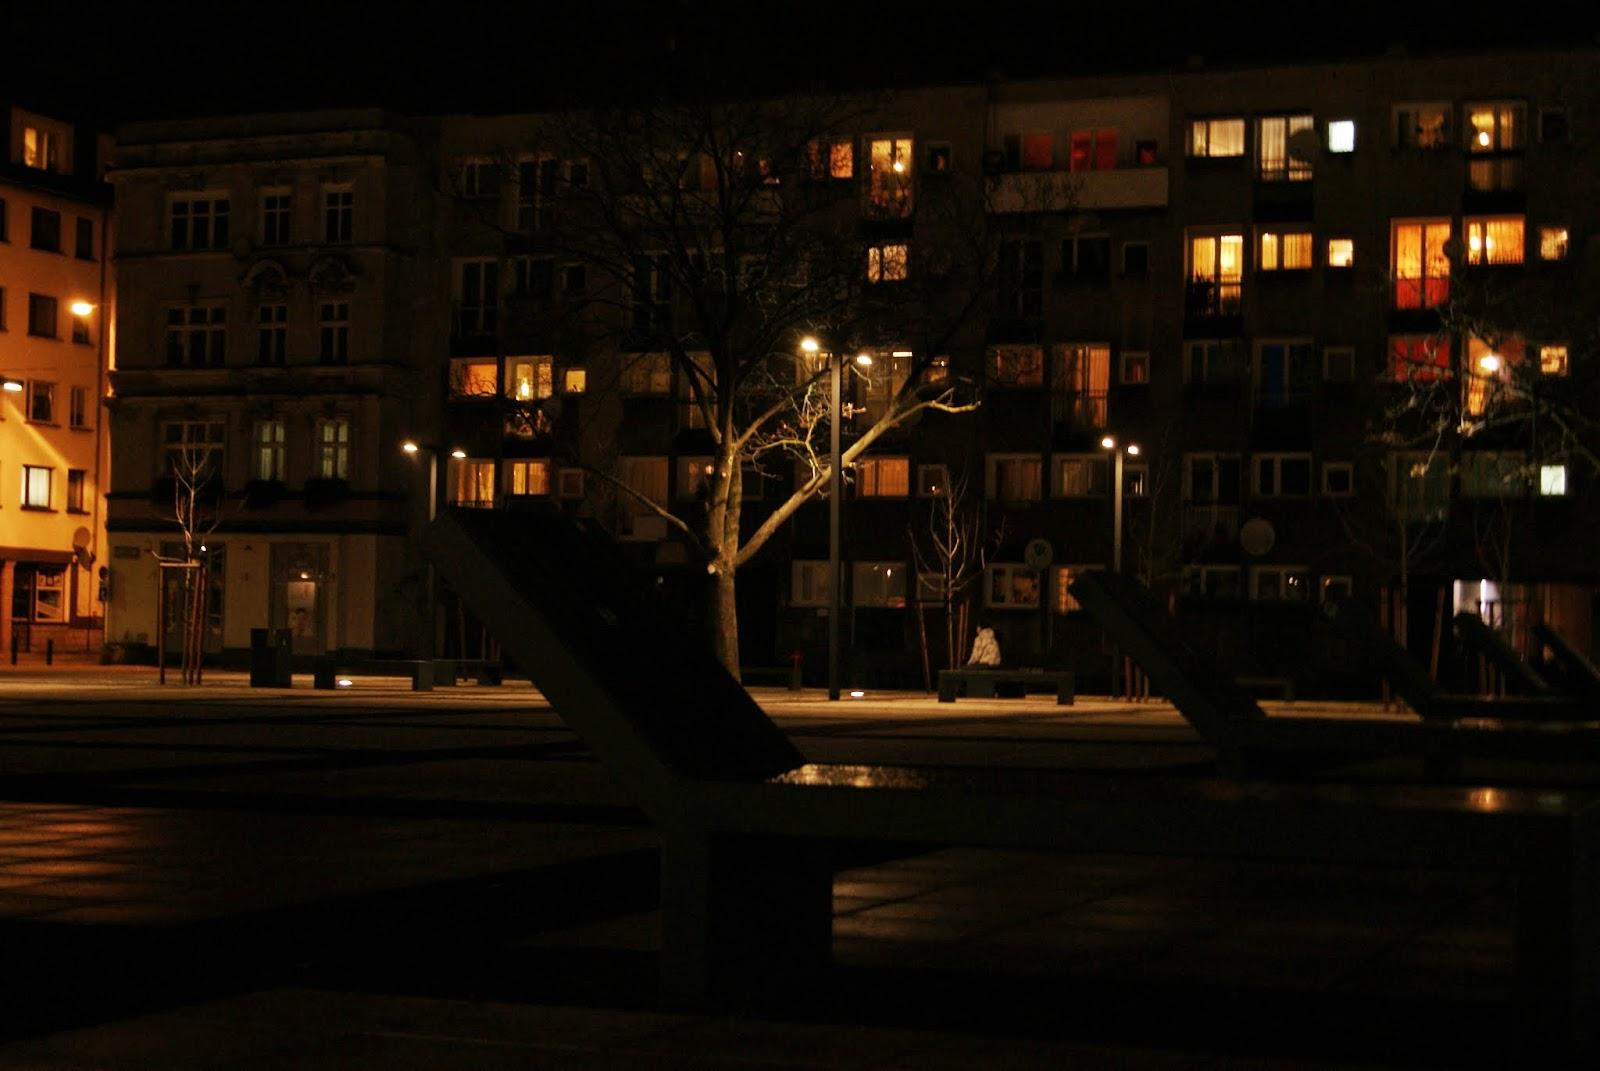 plac Nowy Targ wrocław noc